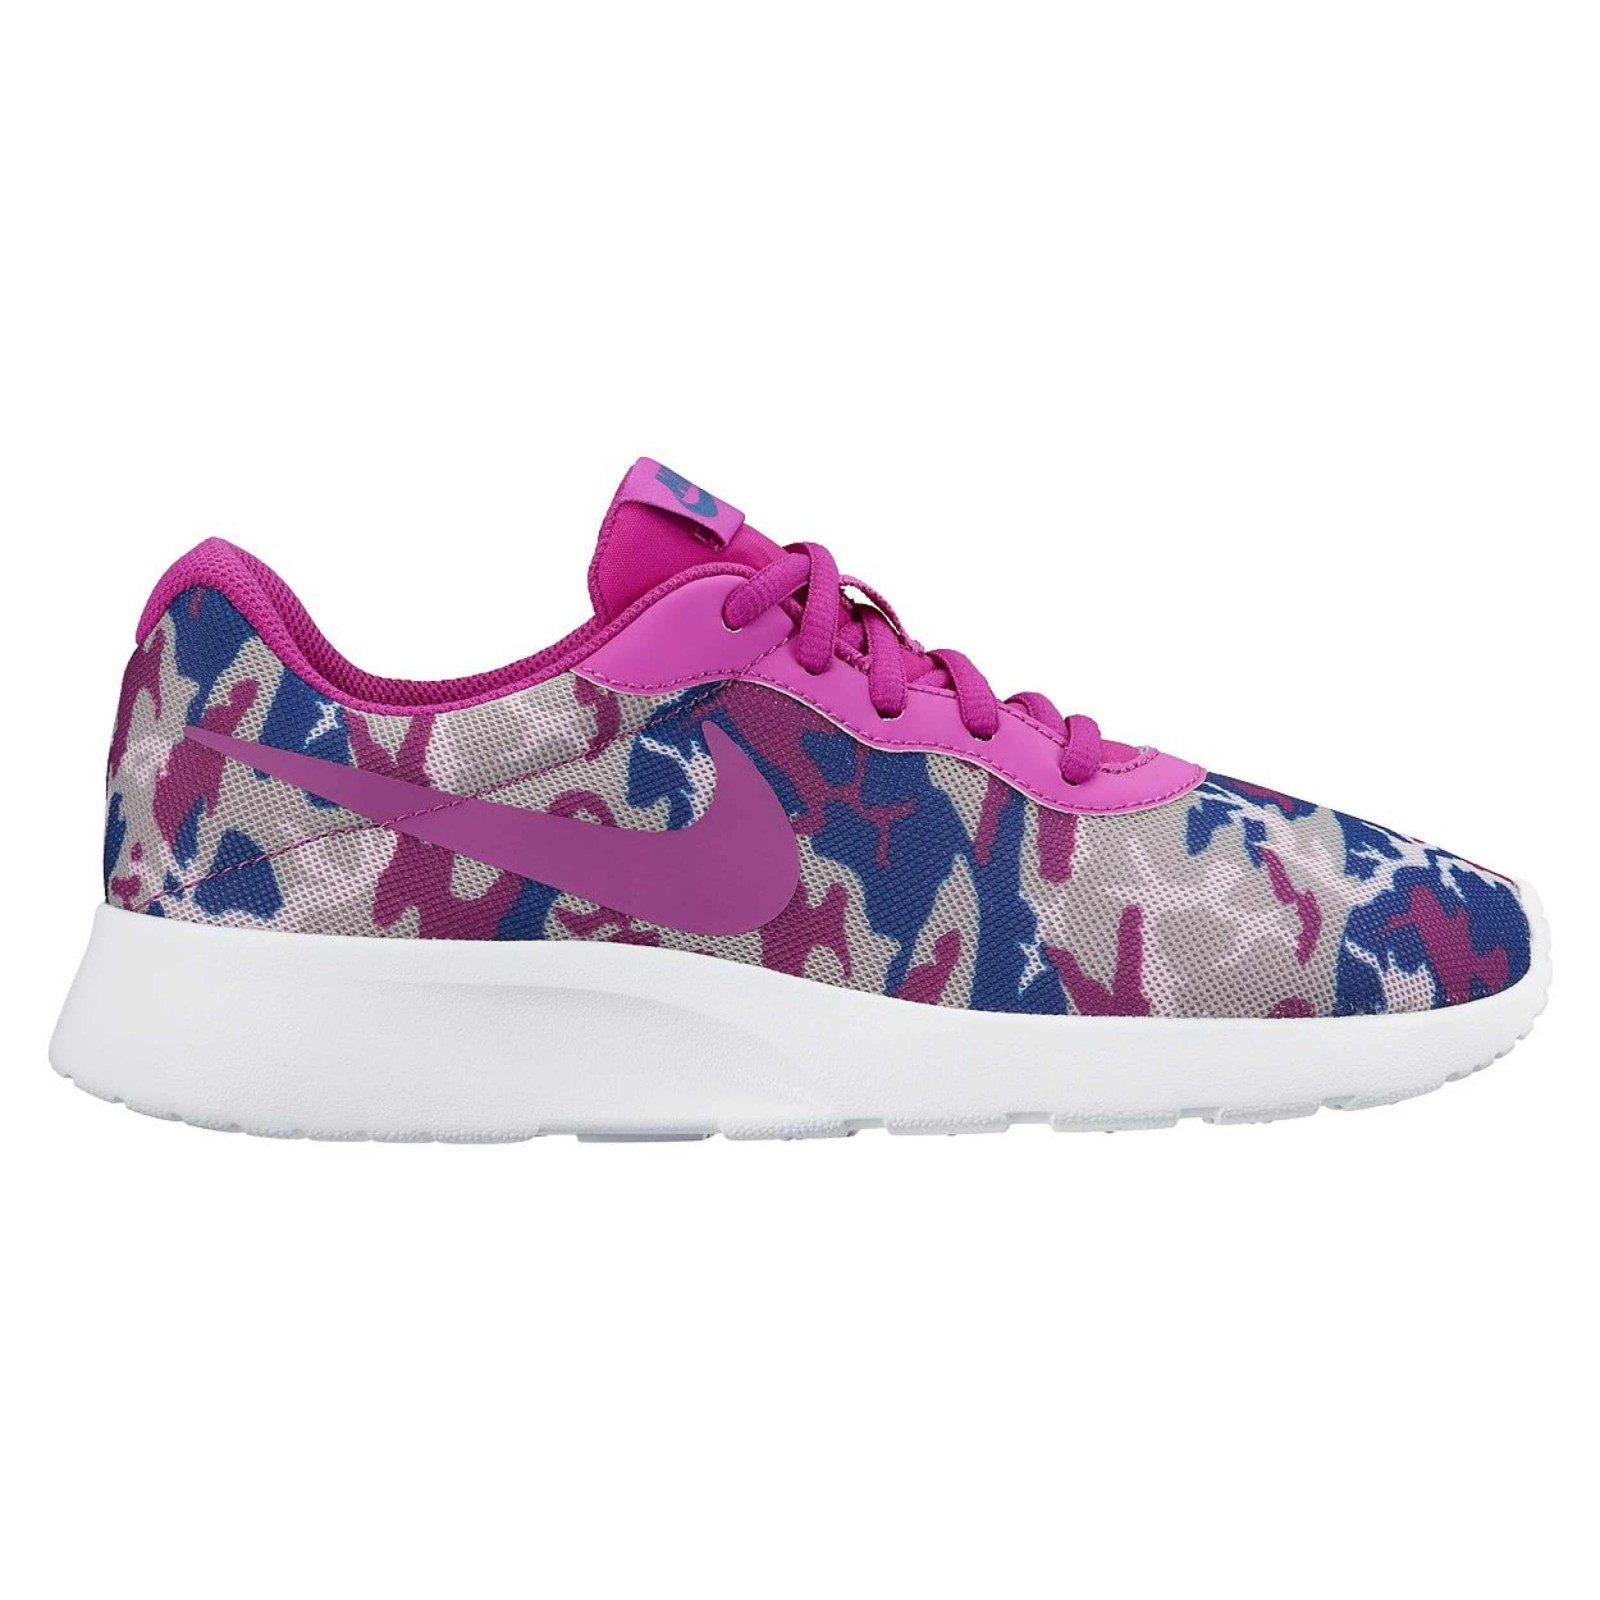 Dámské boty Nike WMNS Tanjun barevné  1b7317ceb1